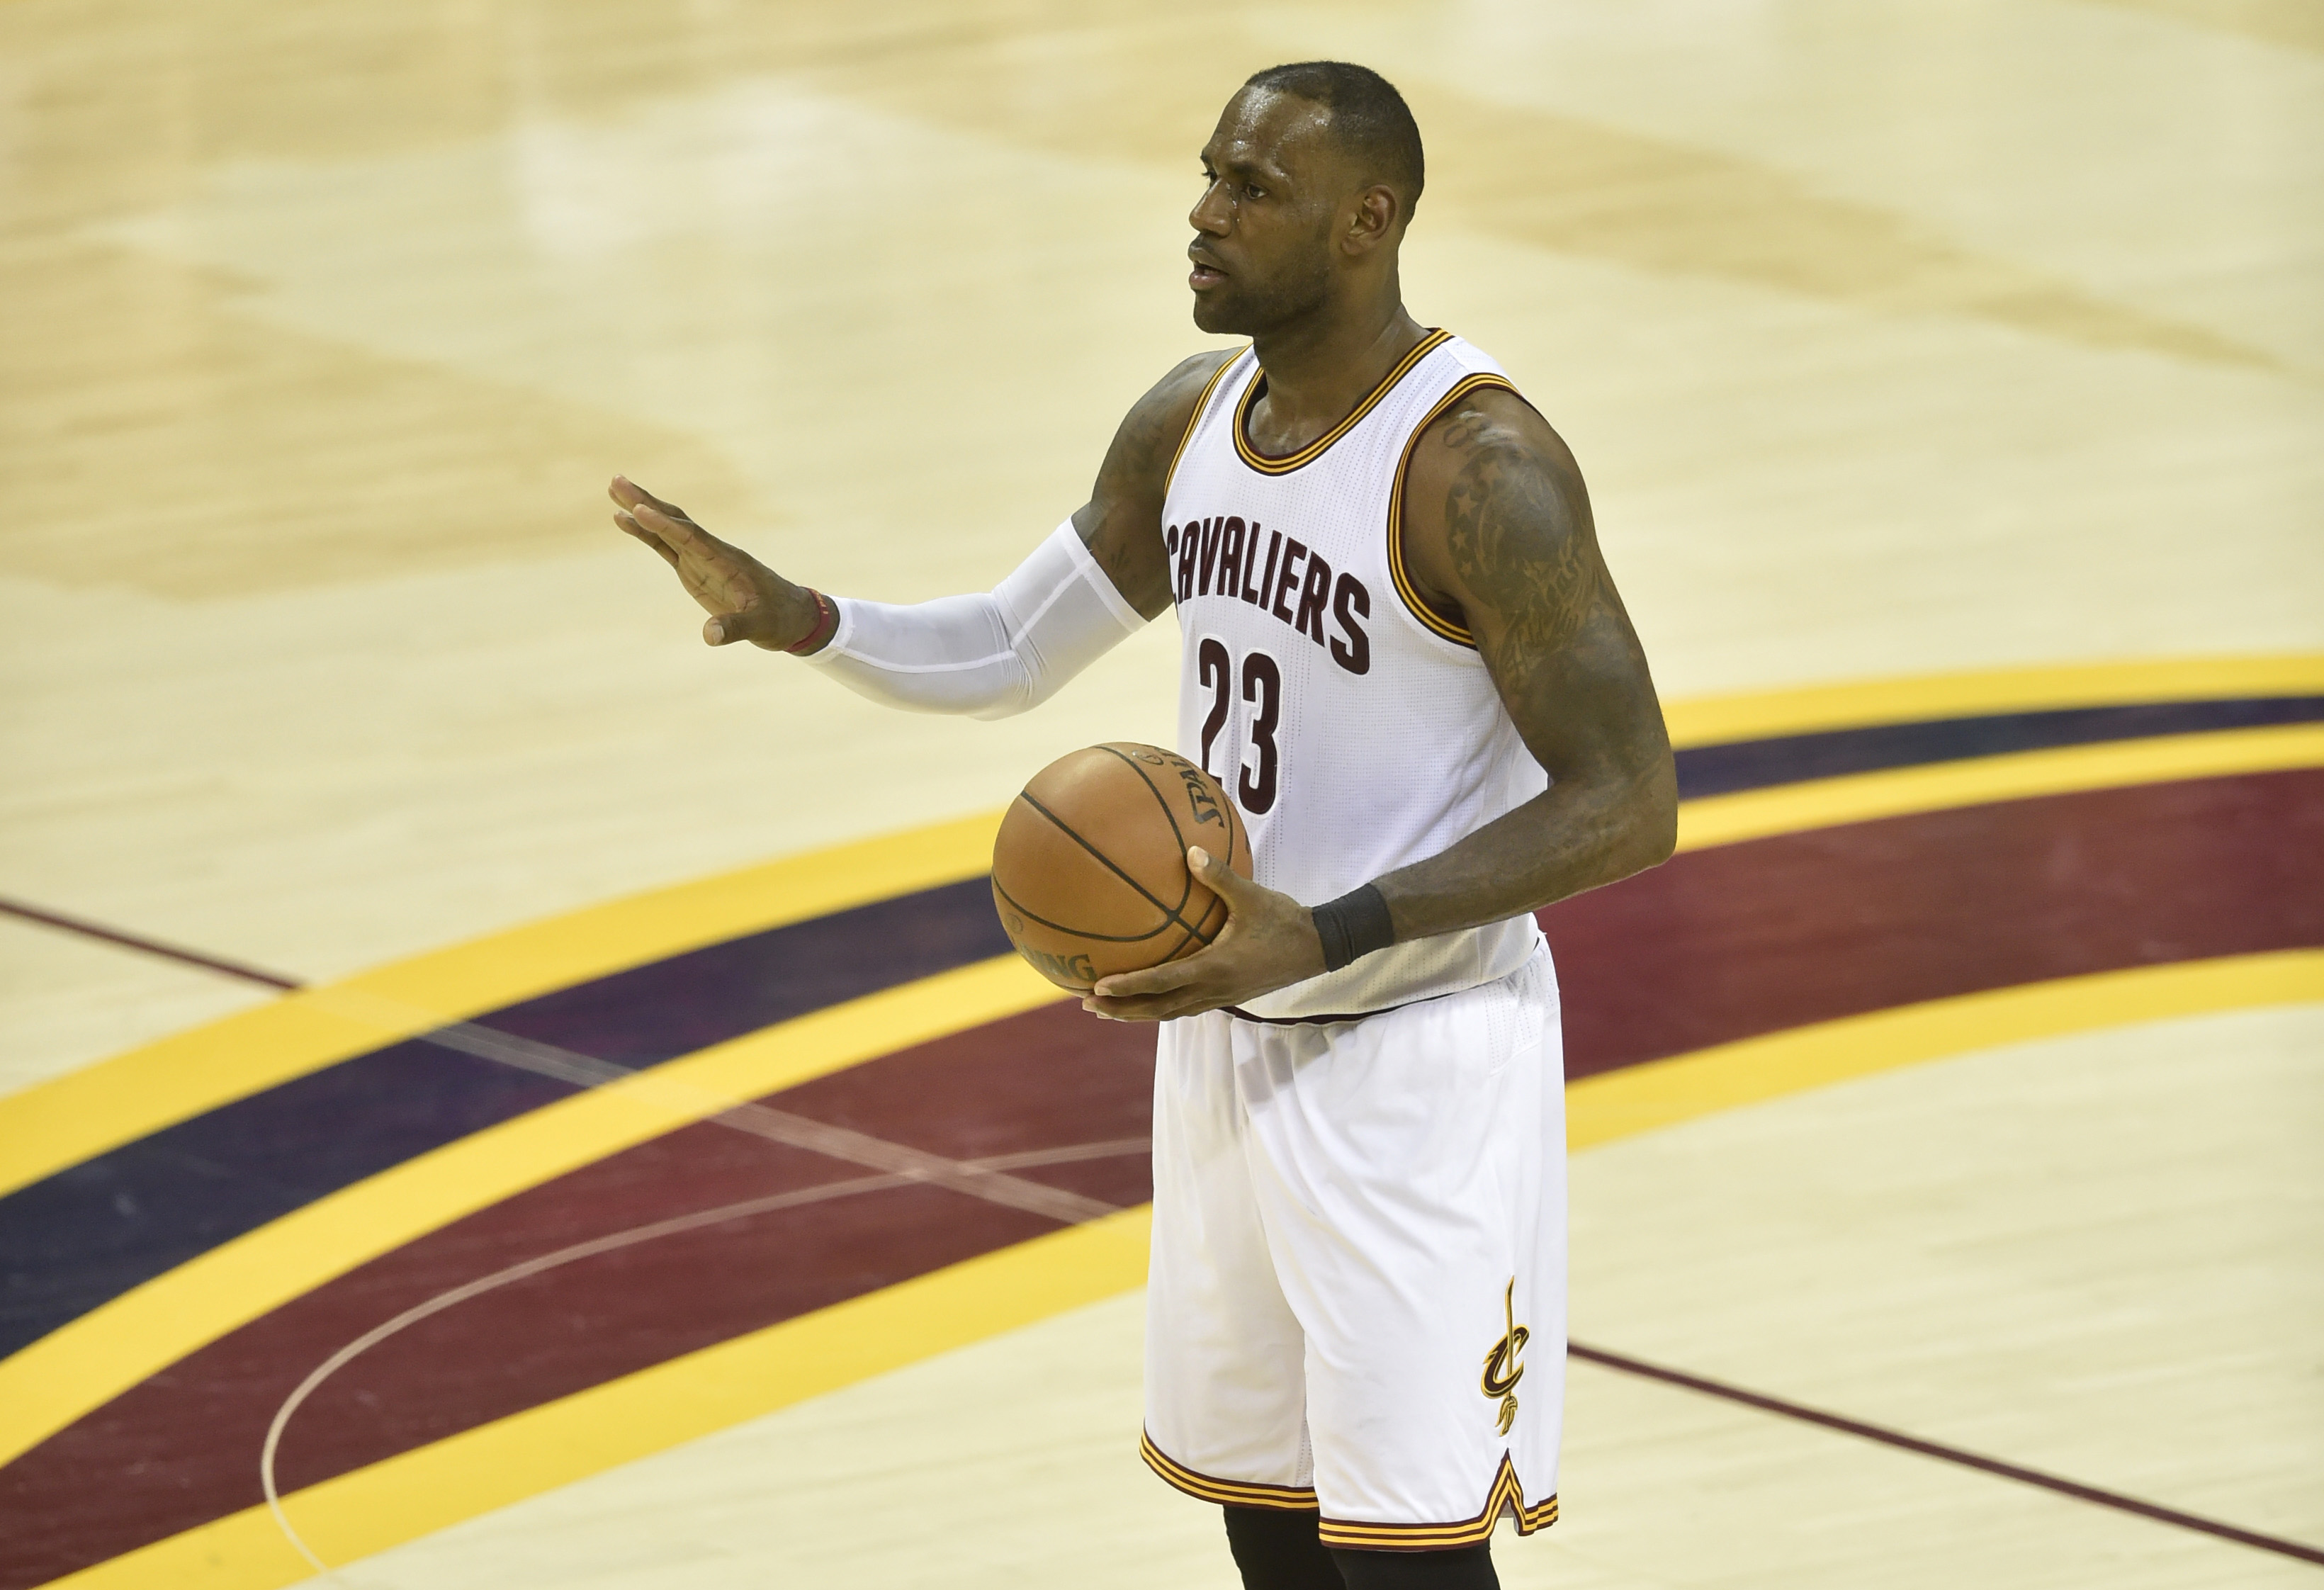 Fantasy Basketball: DraftKings NBA Picks April 17 - Page 2